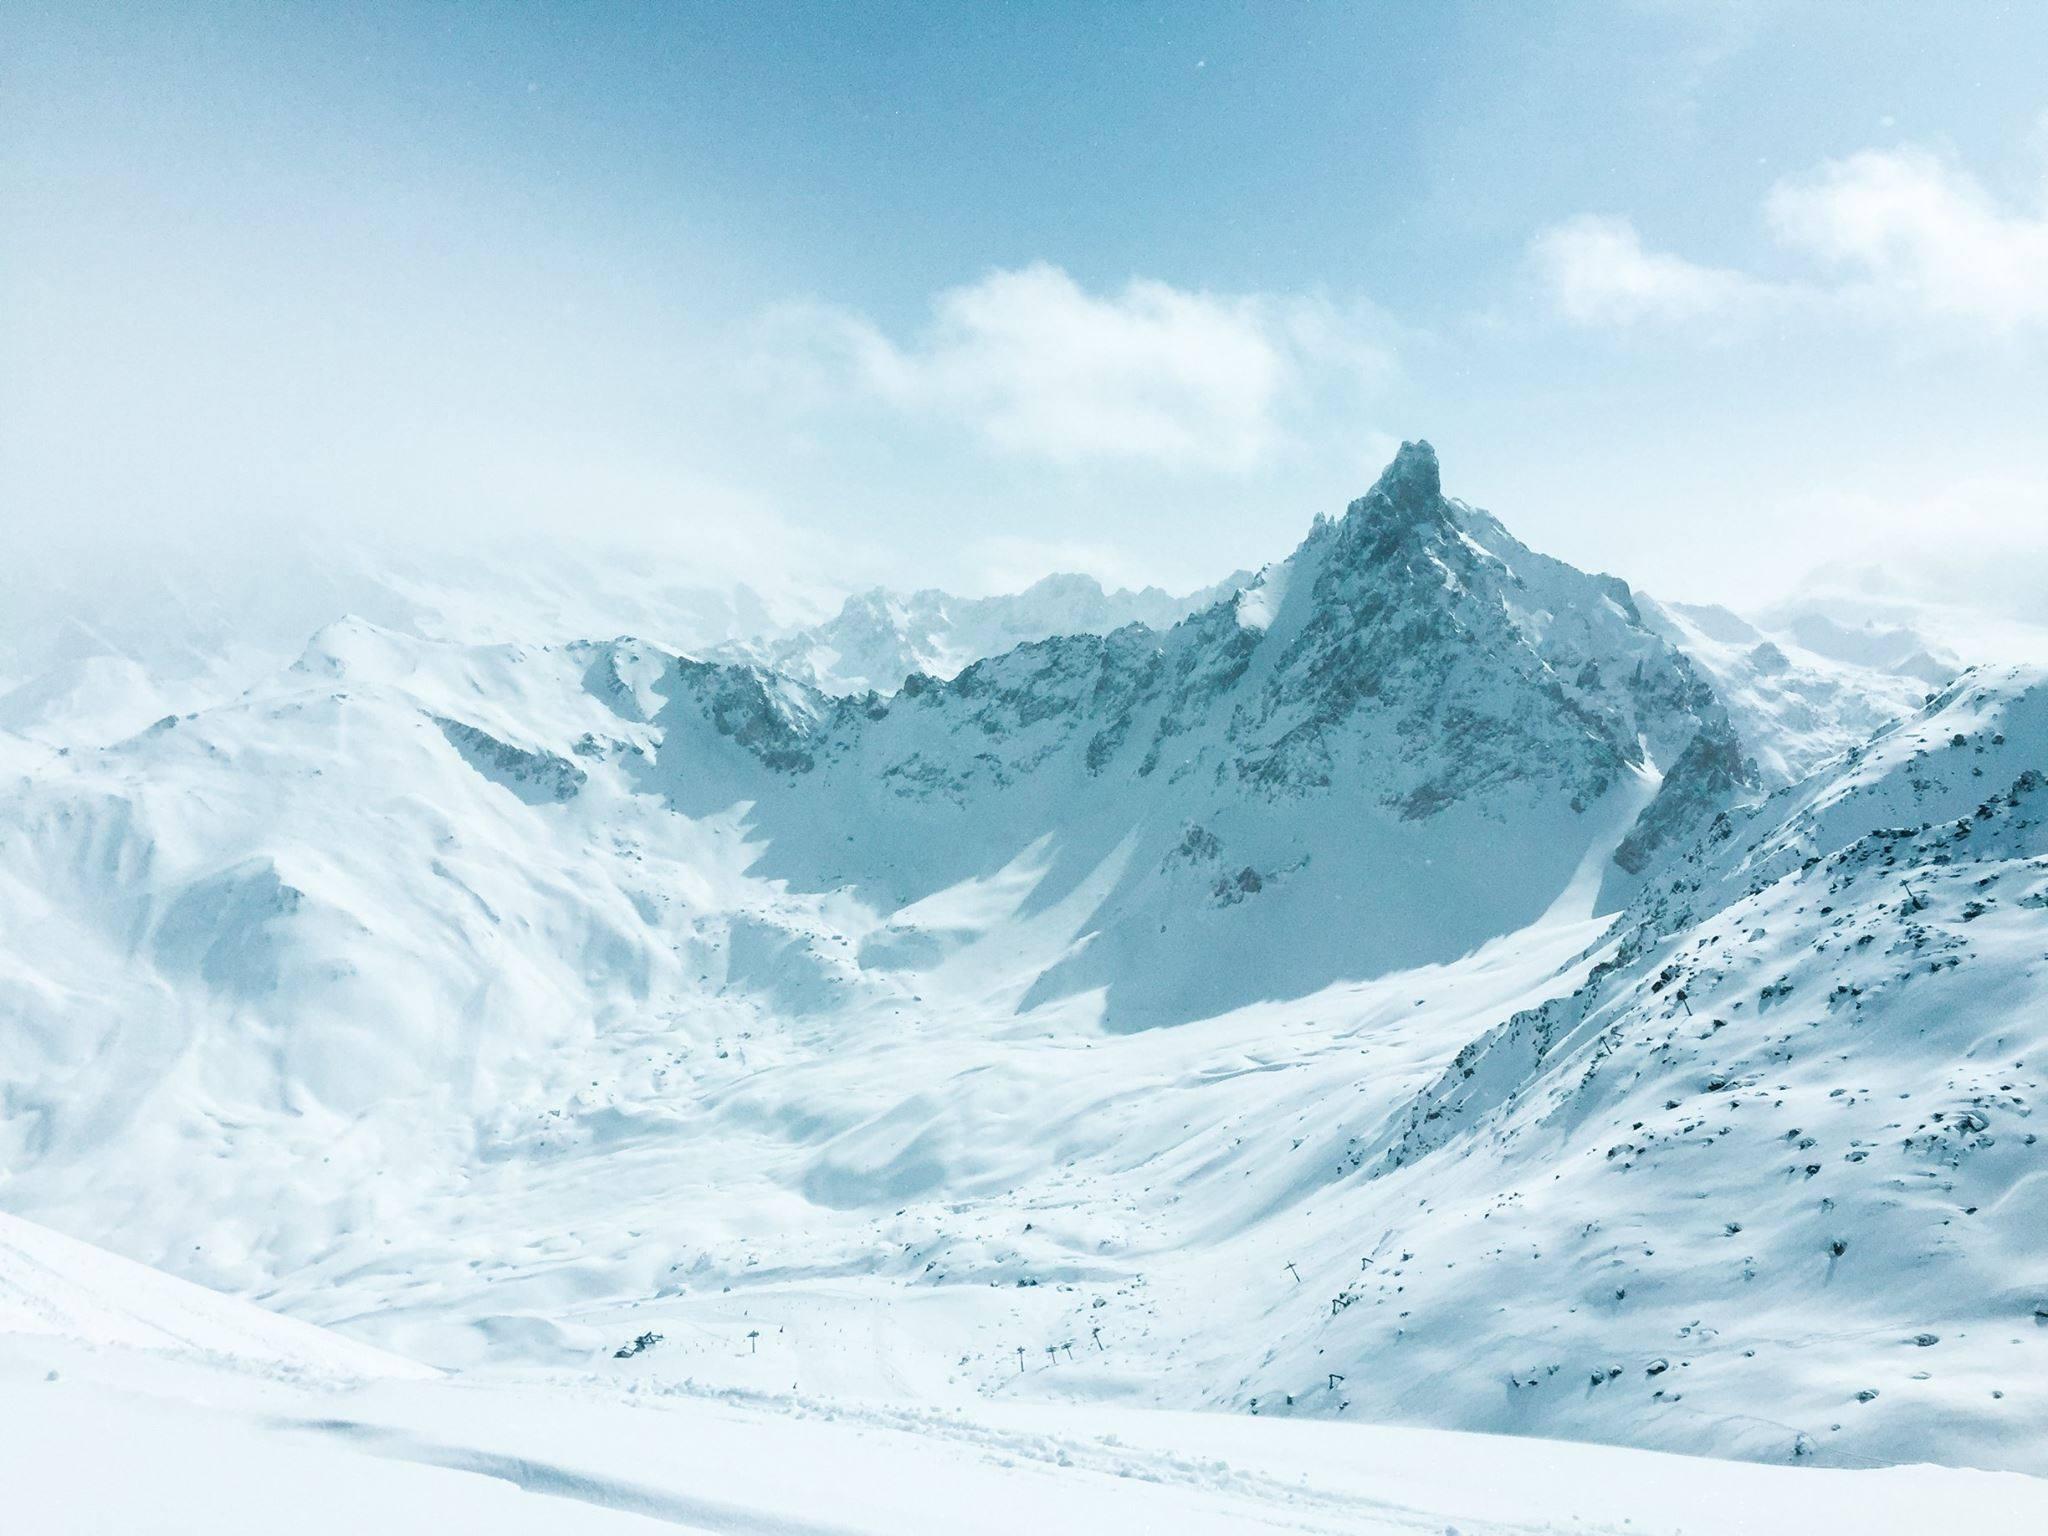 courchevel snow